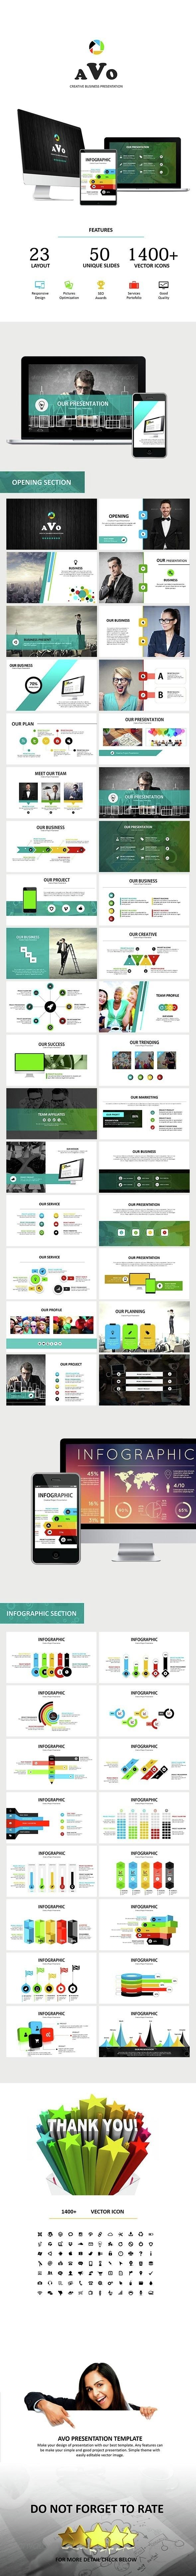 AVO - Google Slides Business Presentation - Google Slides Presentation Templates